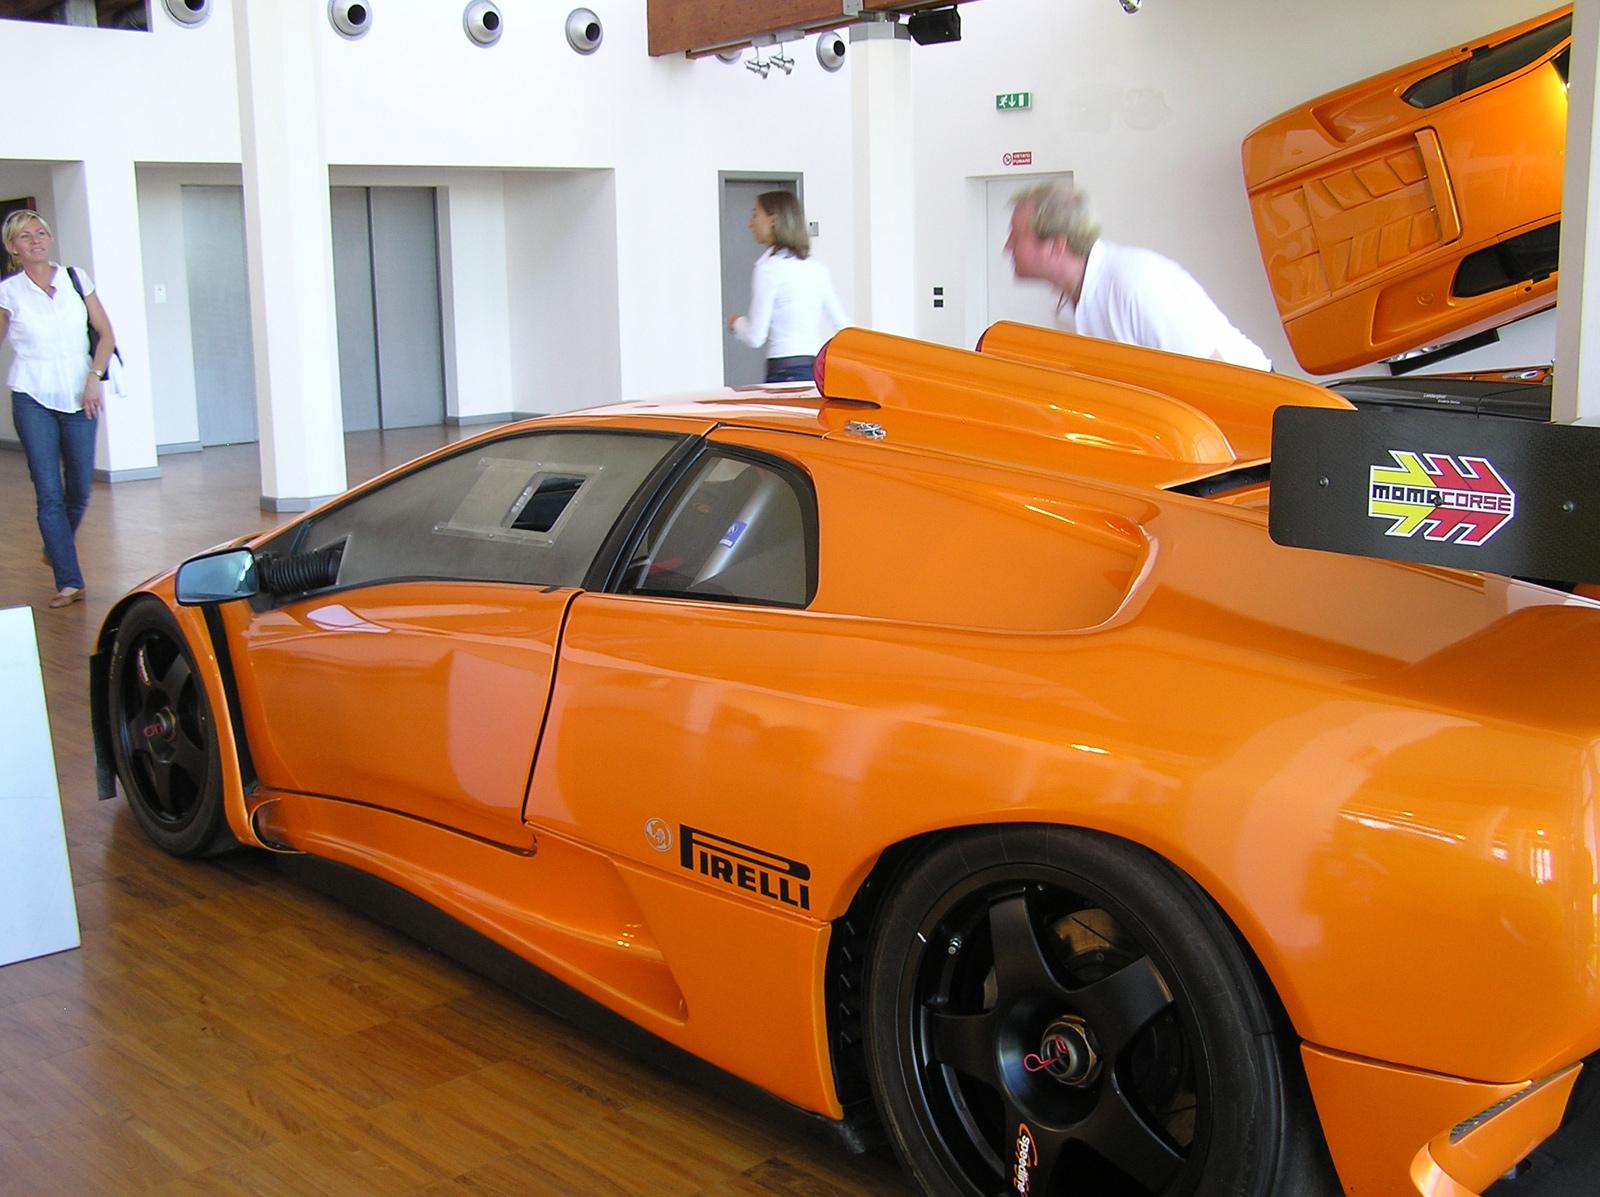 2003 Ferrari F360 Stradale | For Sale | Australia | Buy & Sell Sports,